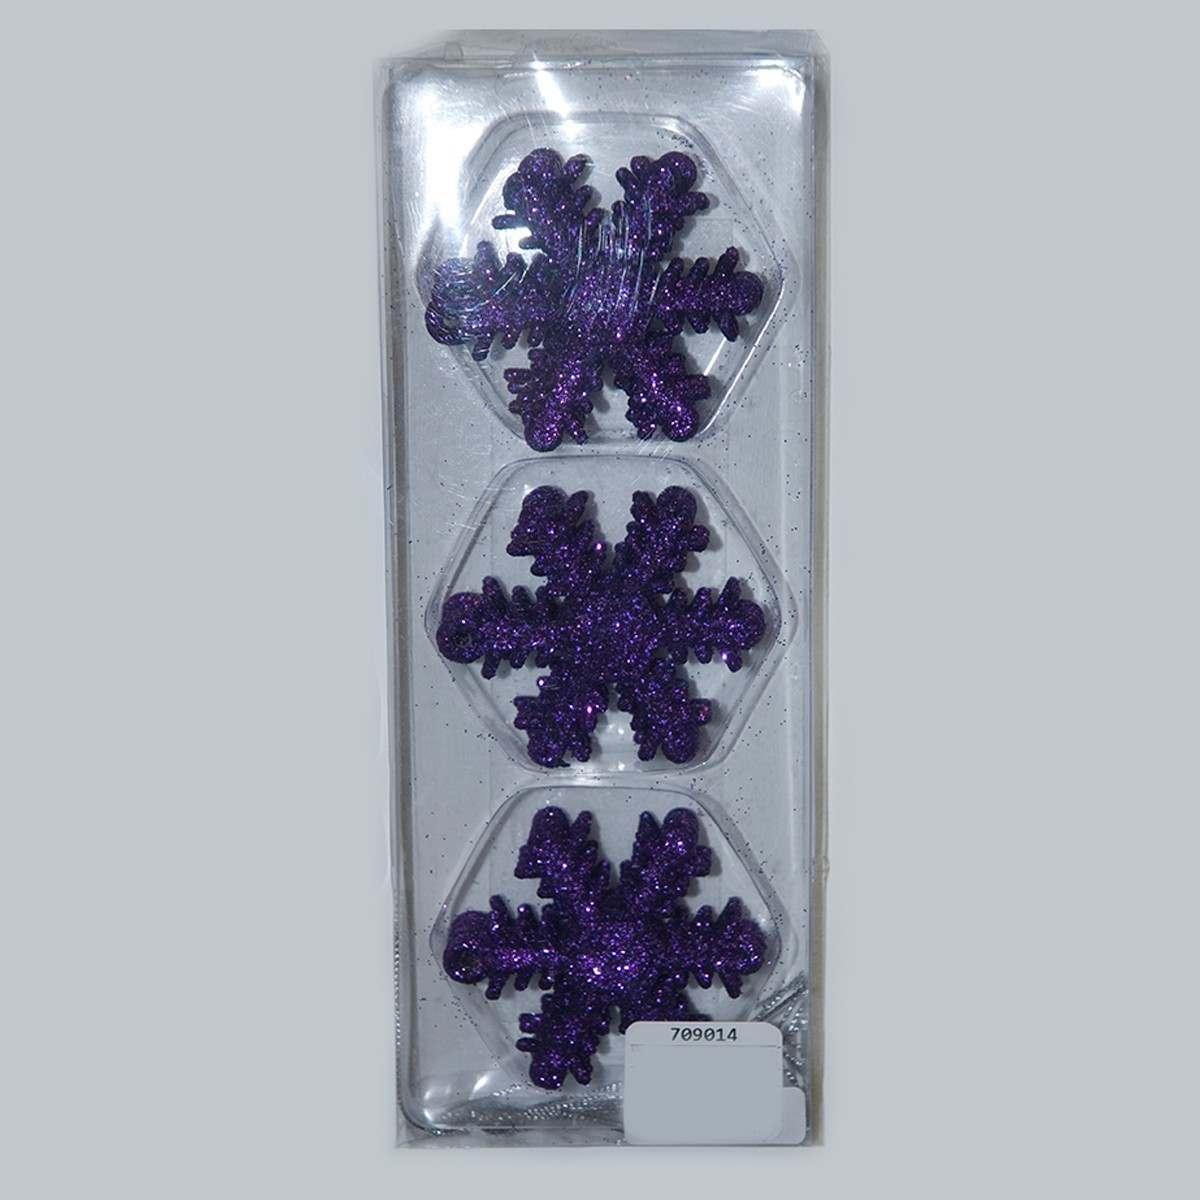 12 x 50mm Royal Purple Shatterproof Snowflakes